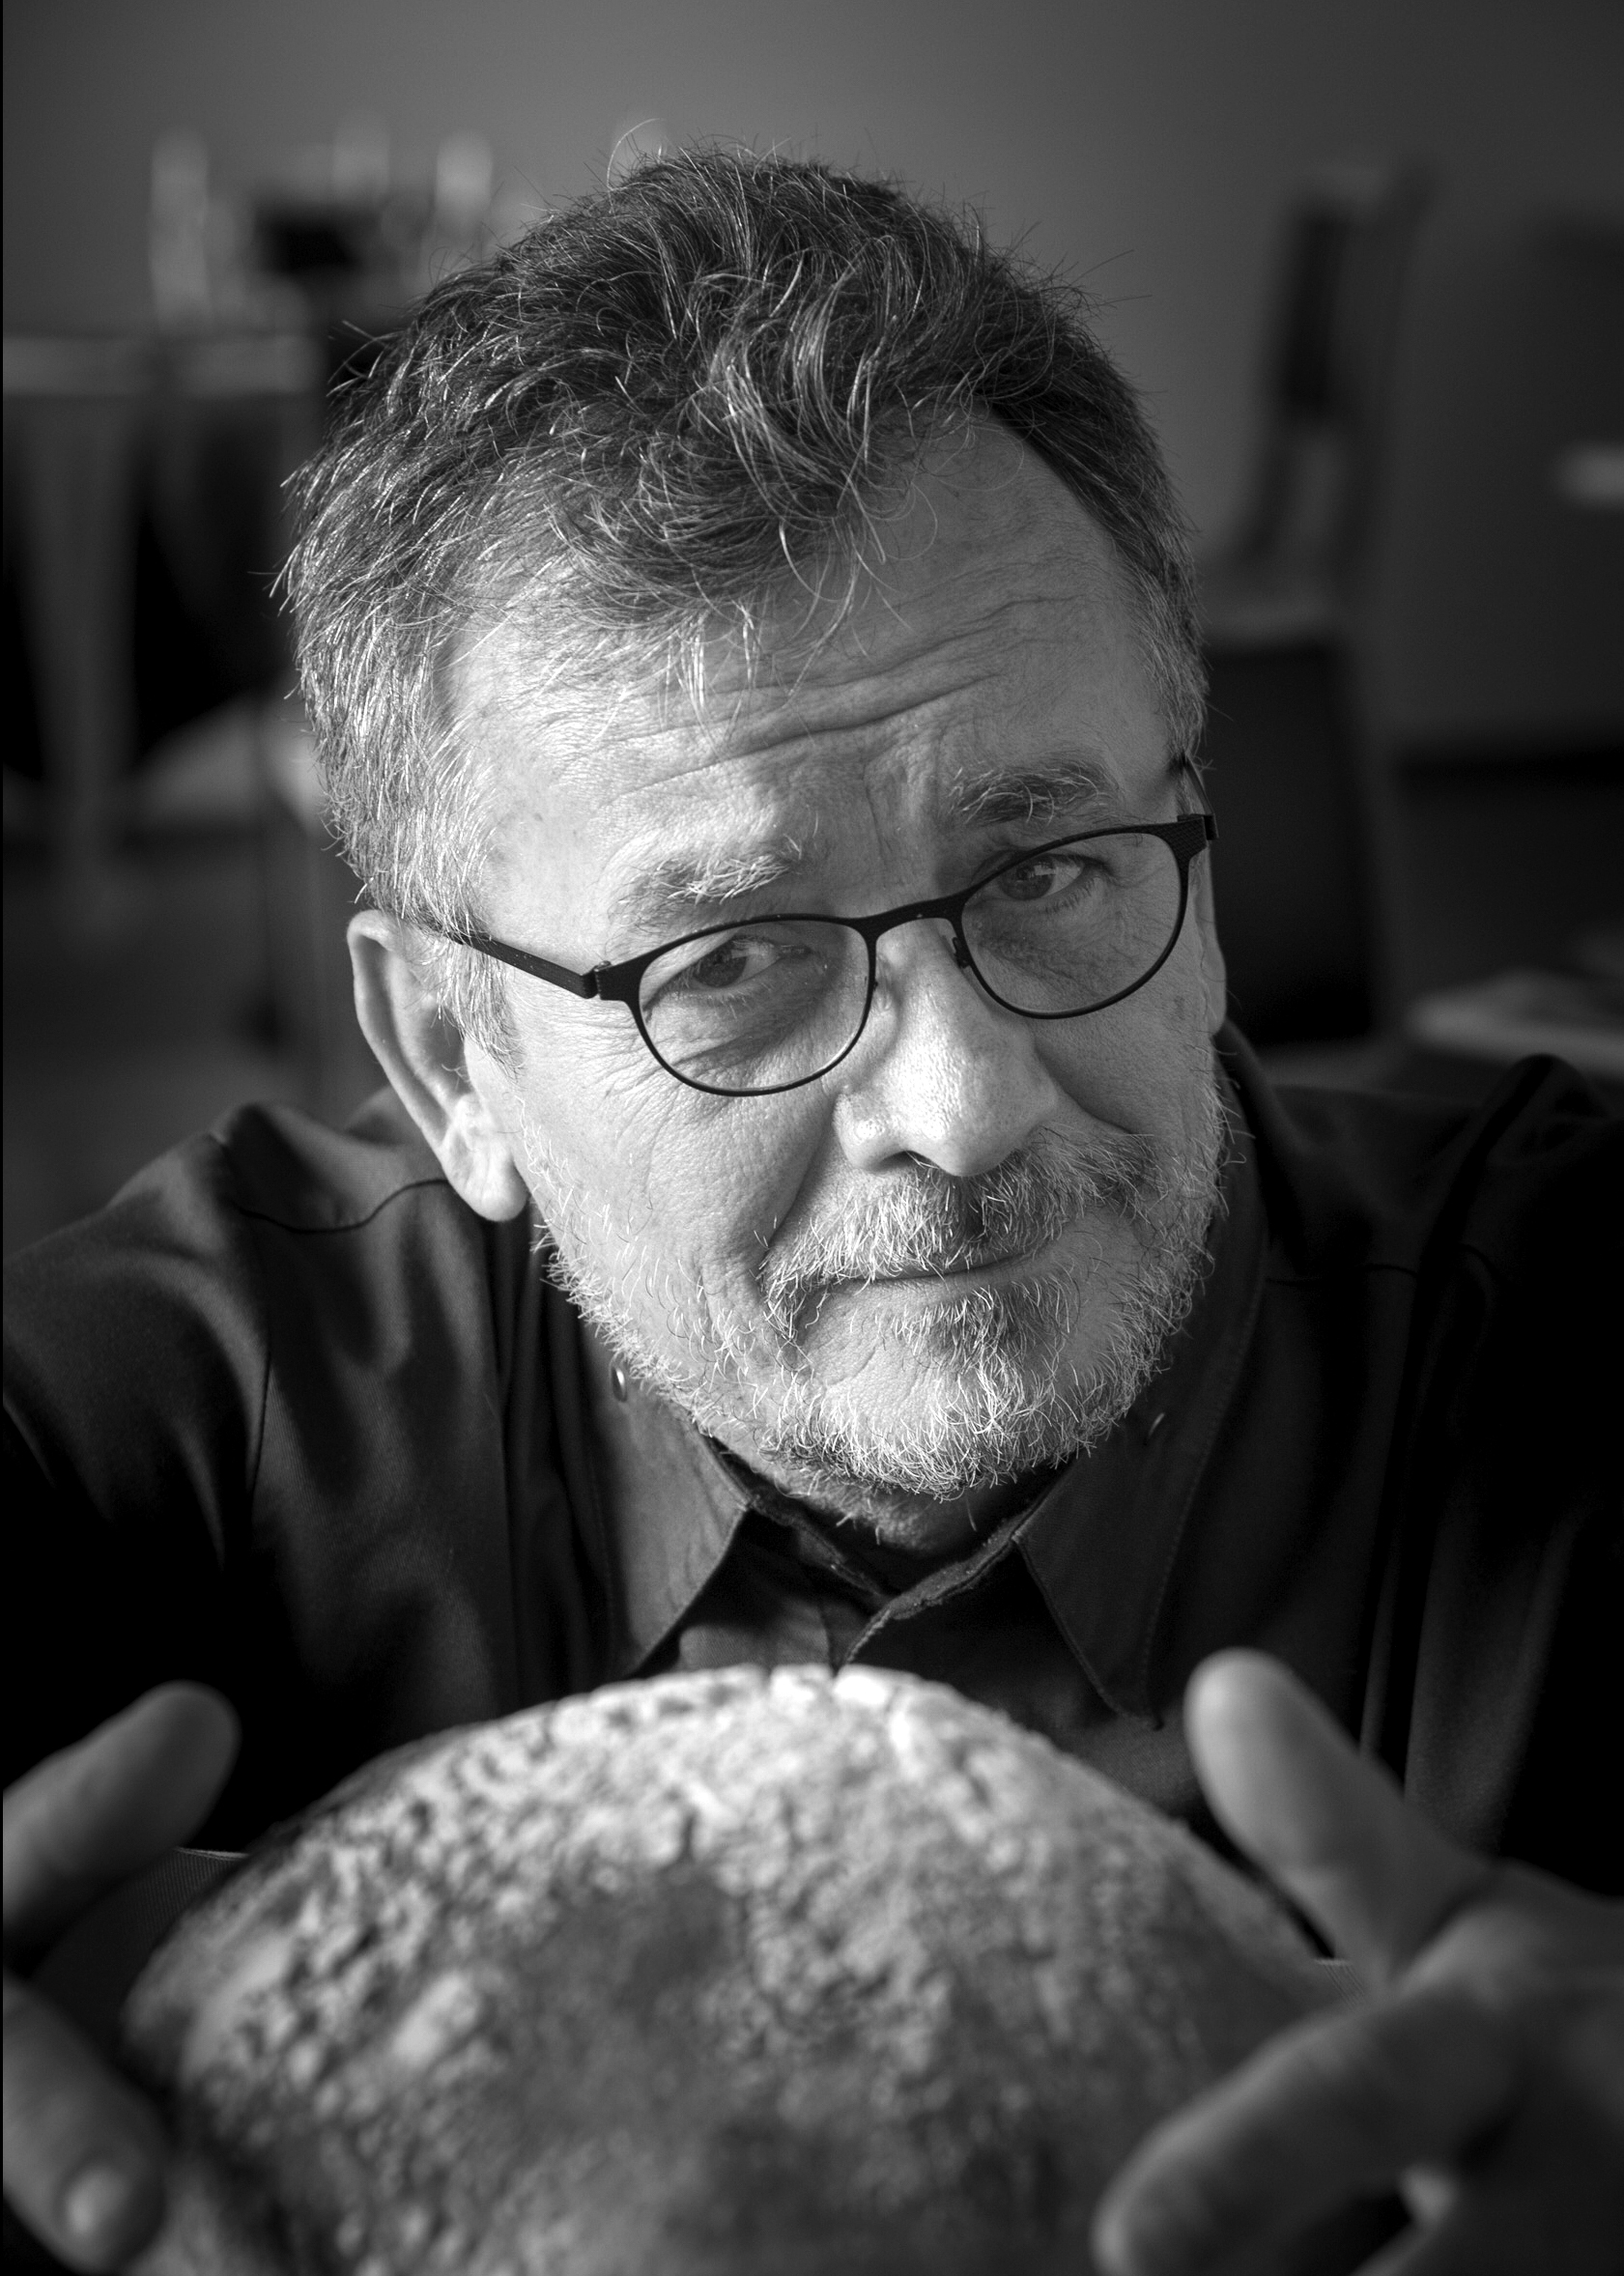 Jean-Claude Marlhins